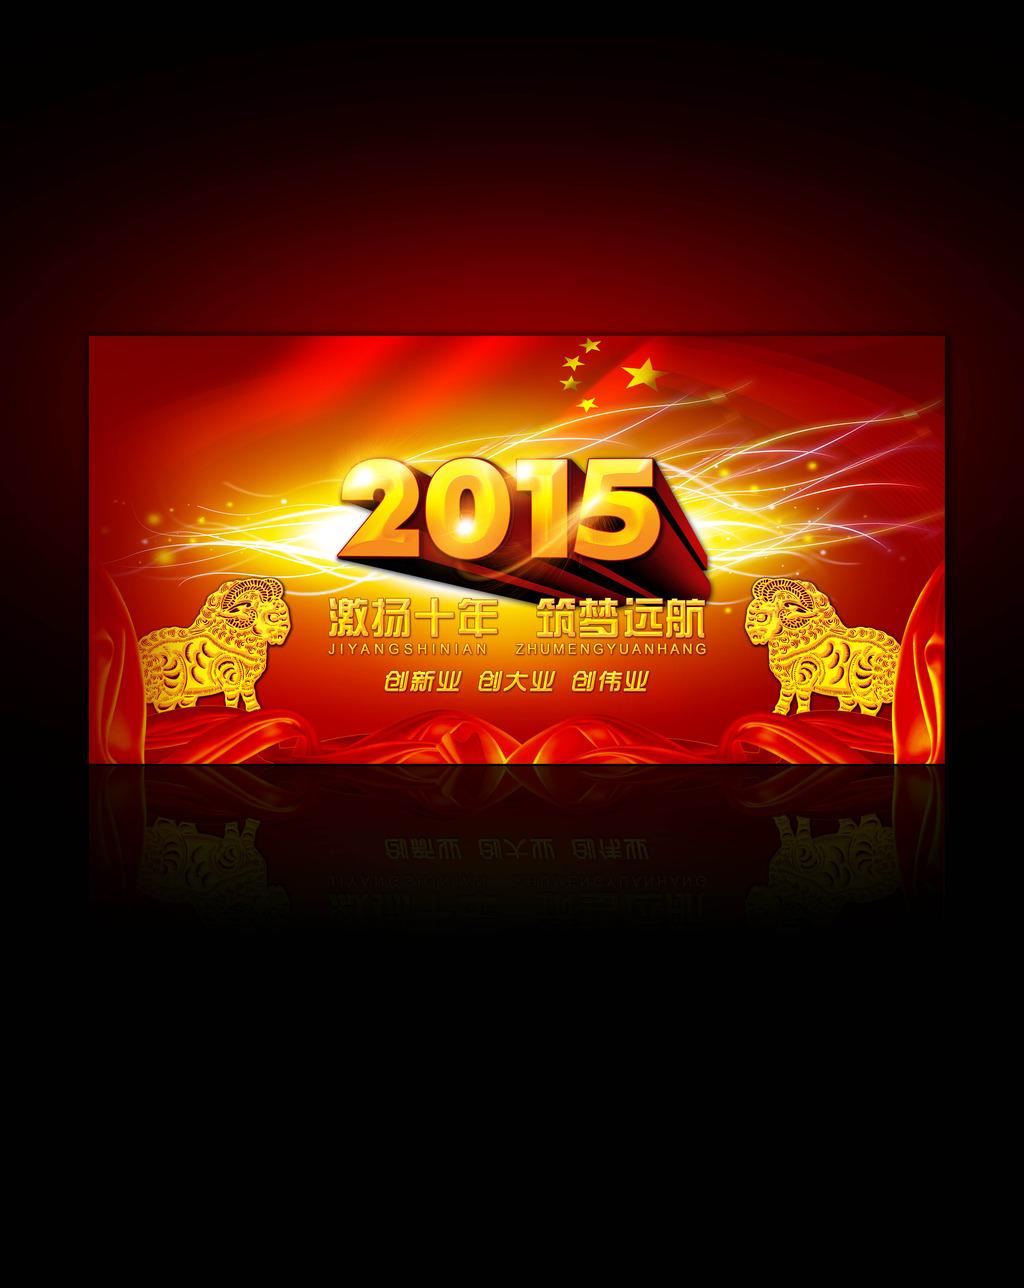 2015�$9.��j�:i[Z�`_羊年2015春节企业年会背景